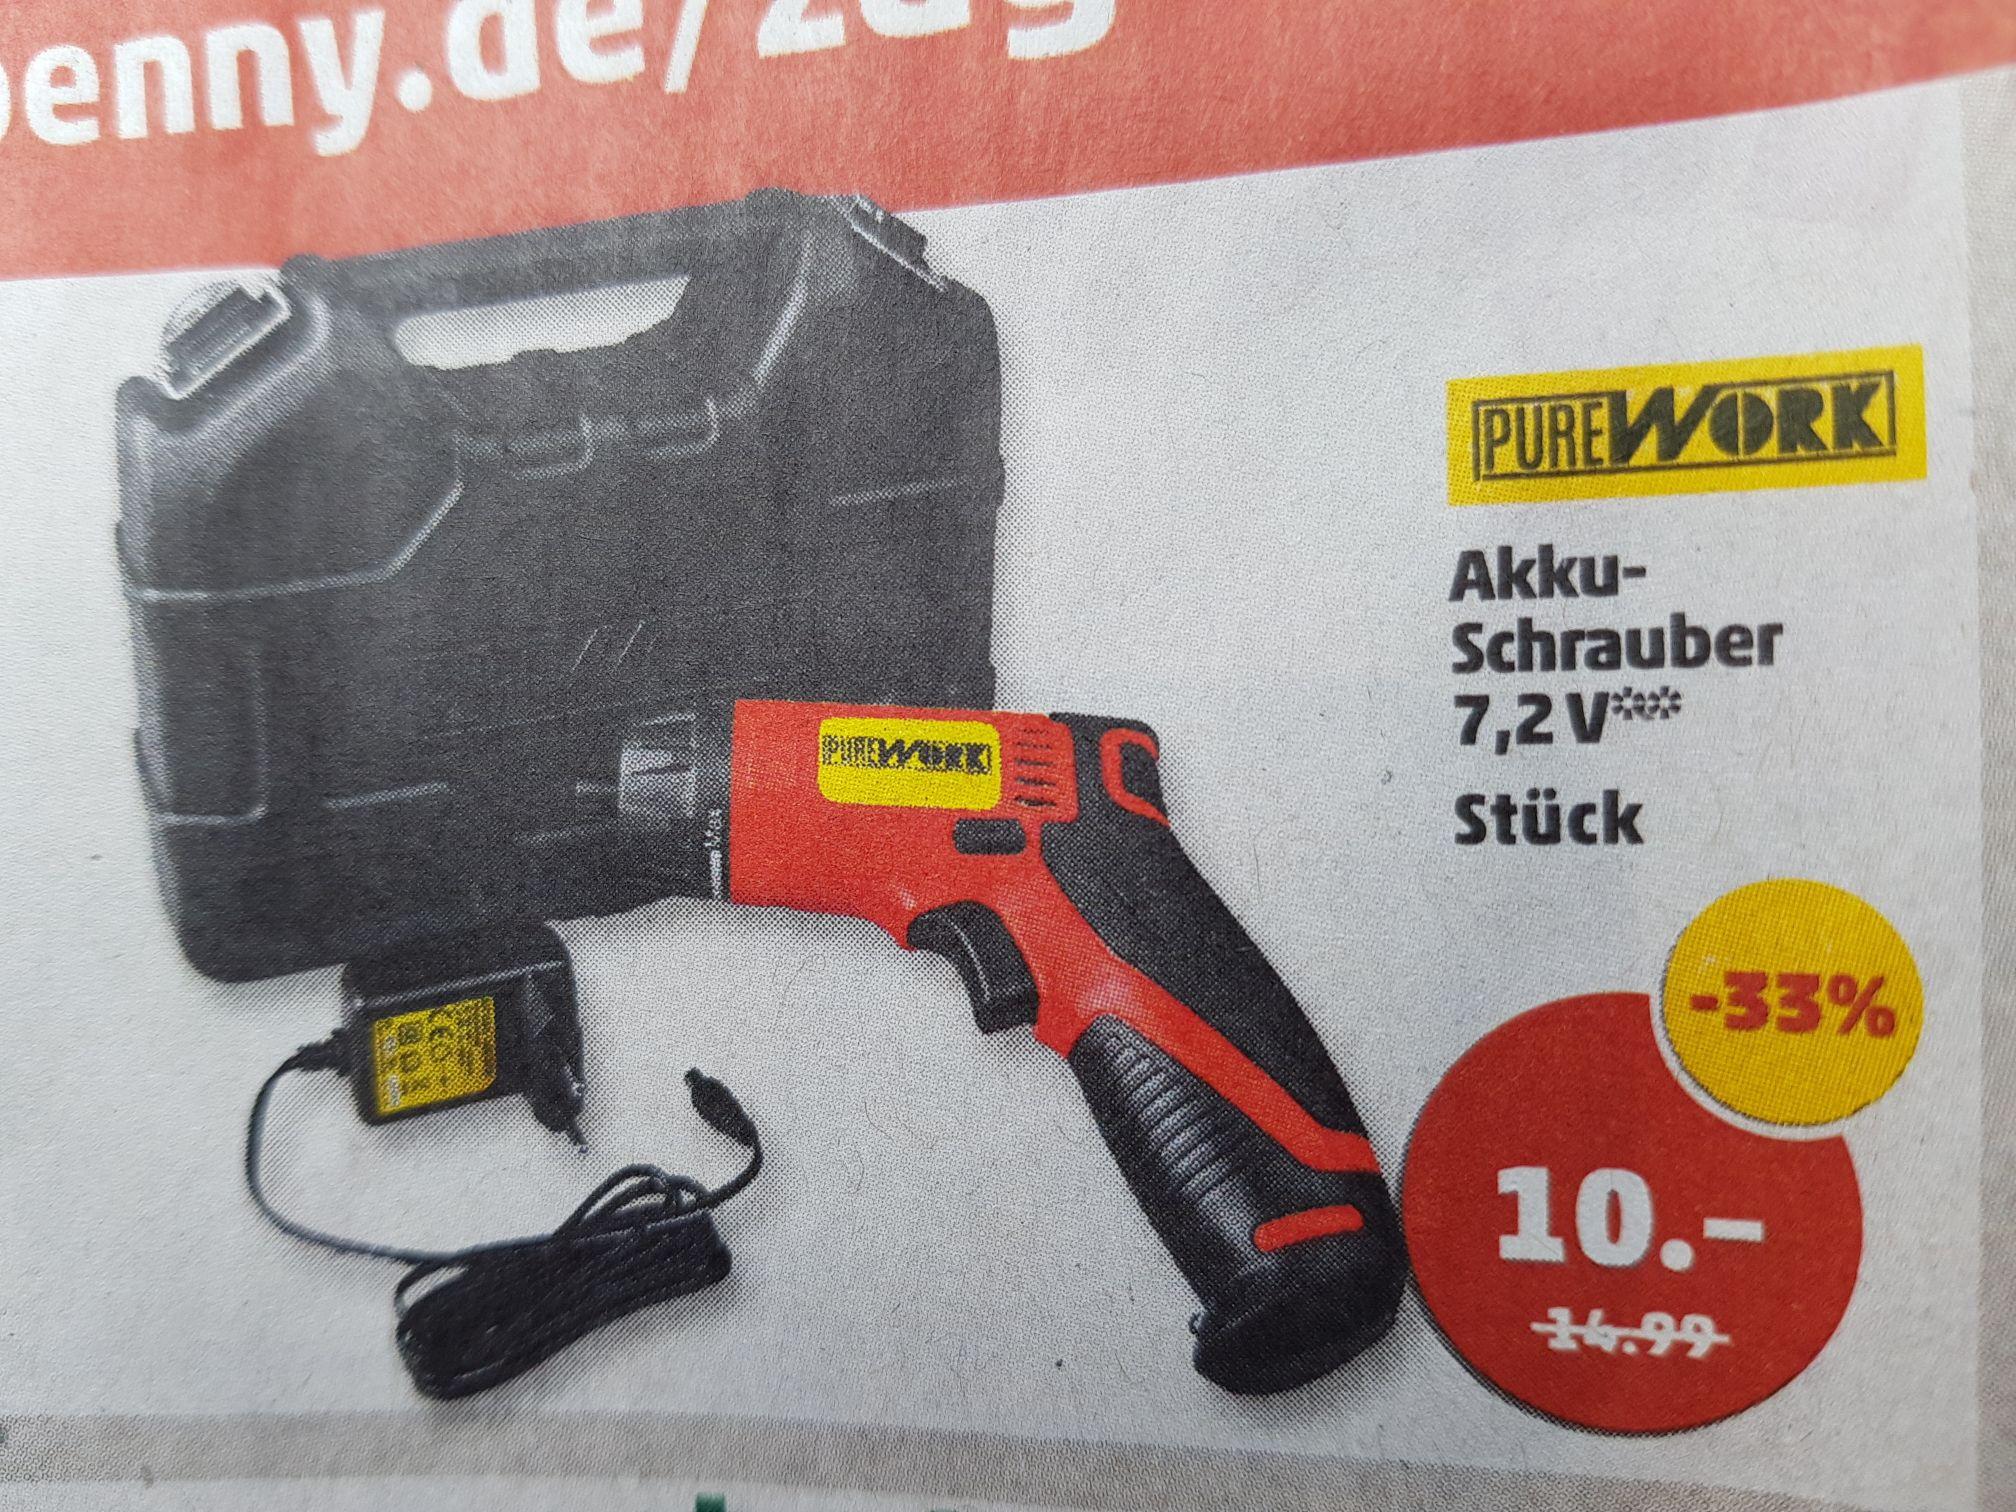 [Penny / ab 21.09] PUREWORK Akku-Schrauber 7,2 V